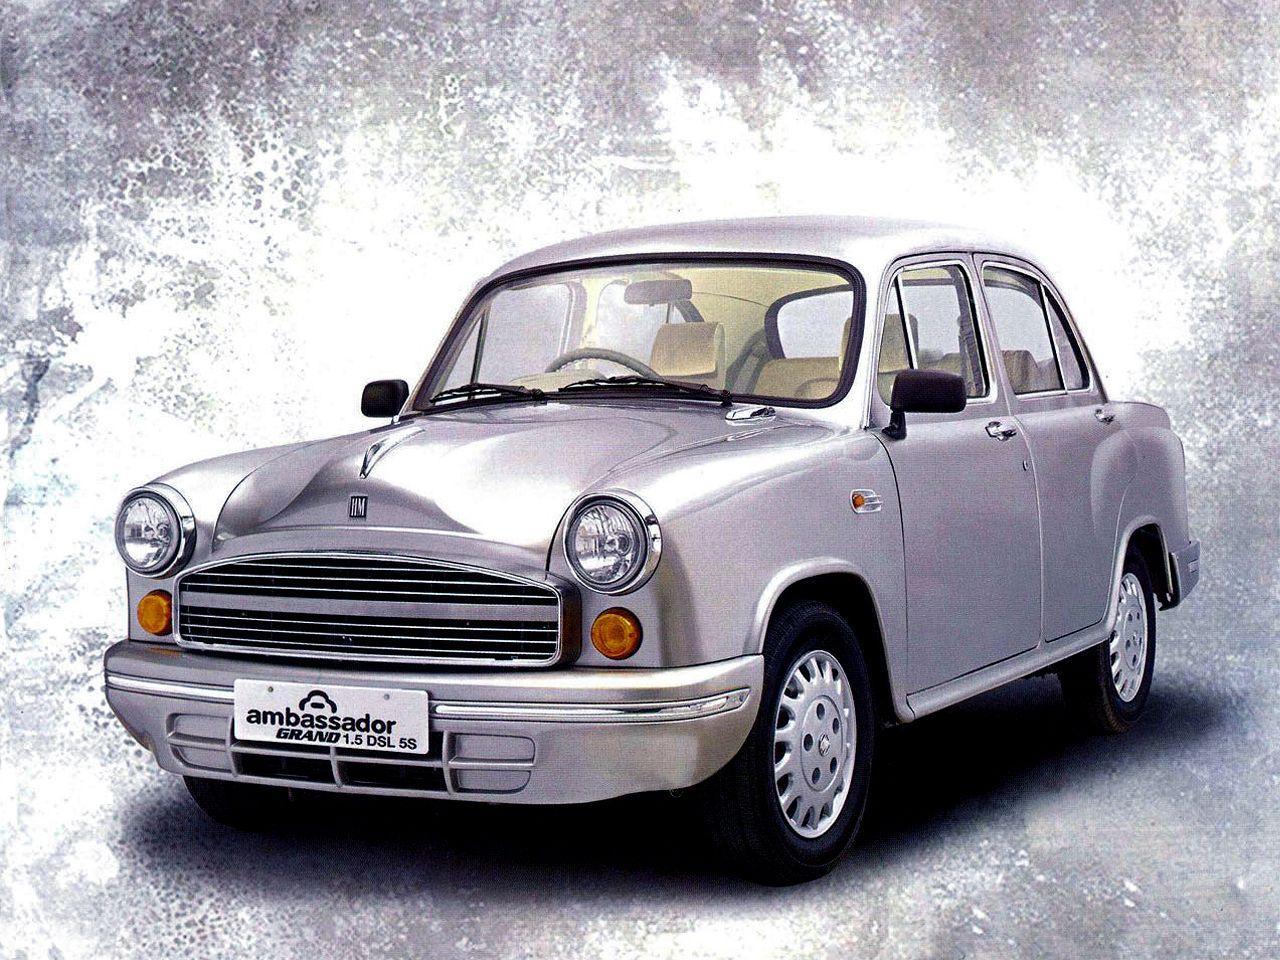 Ambassador Car Wallpapers - Top Free ...